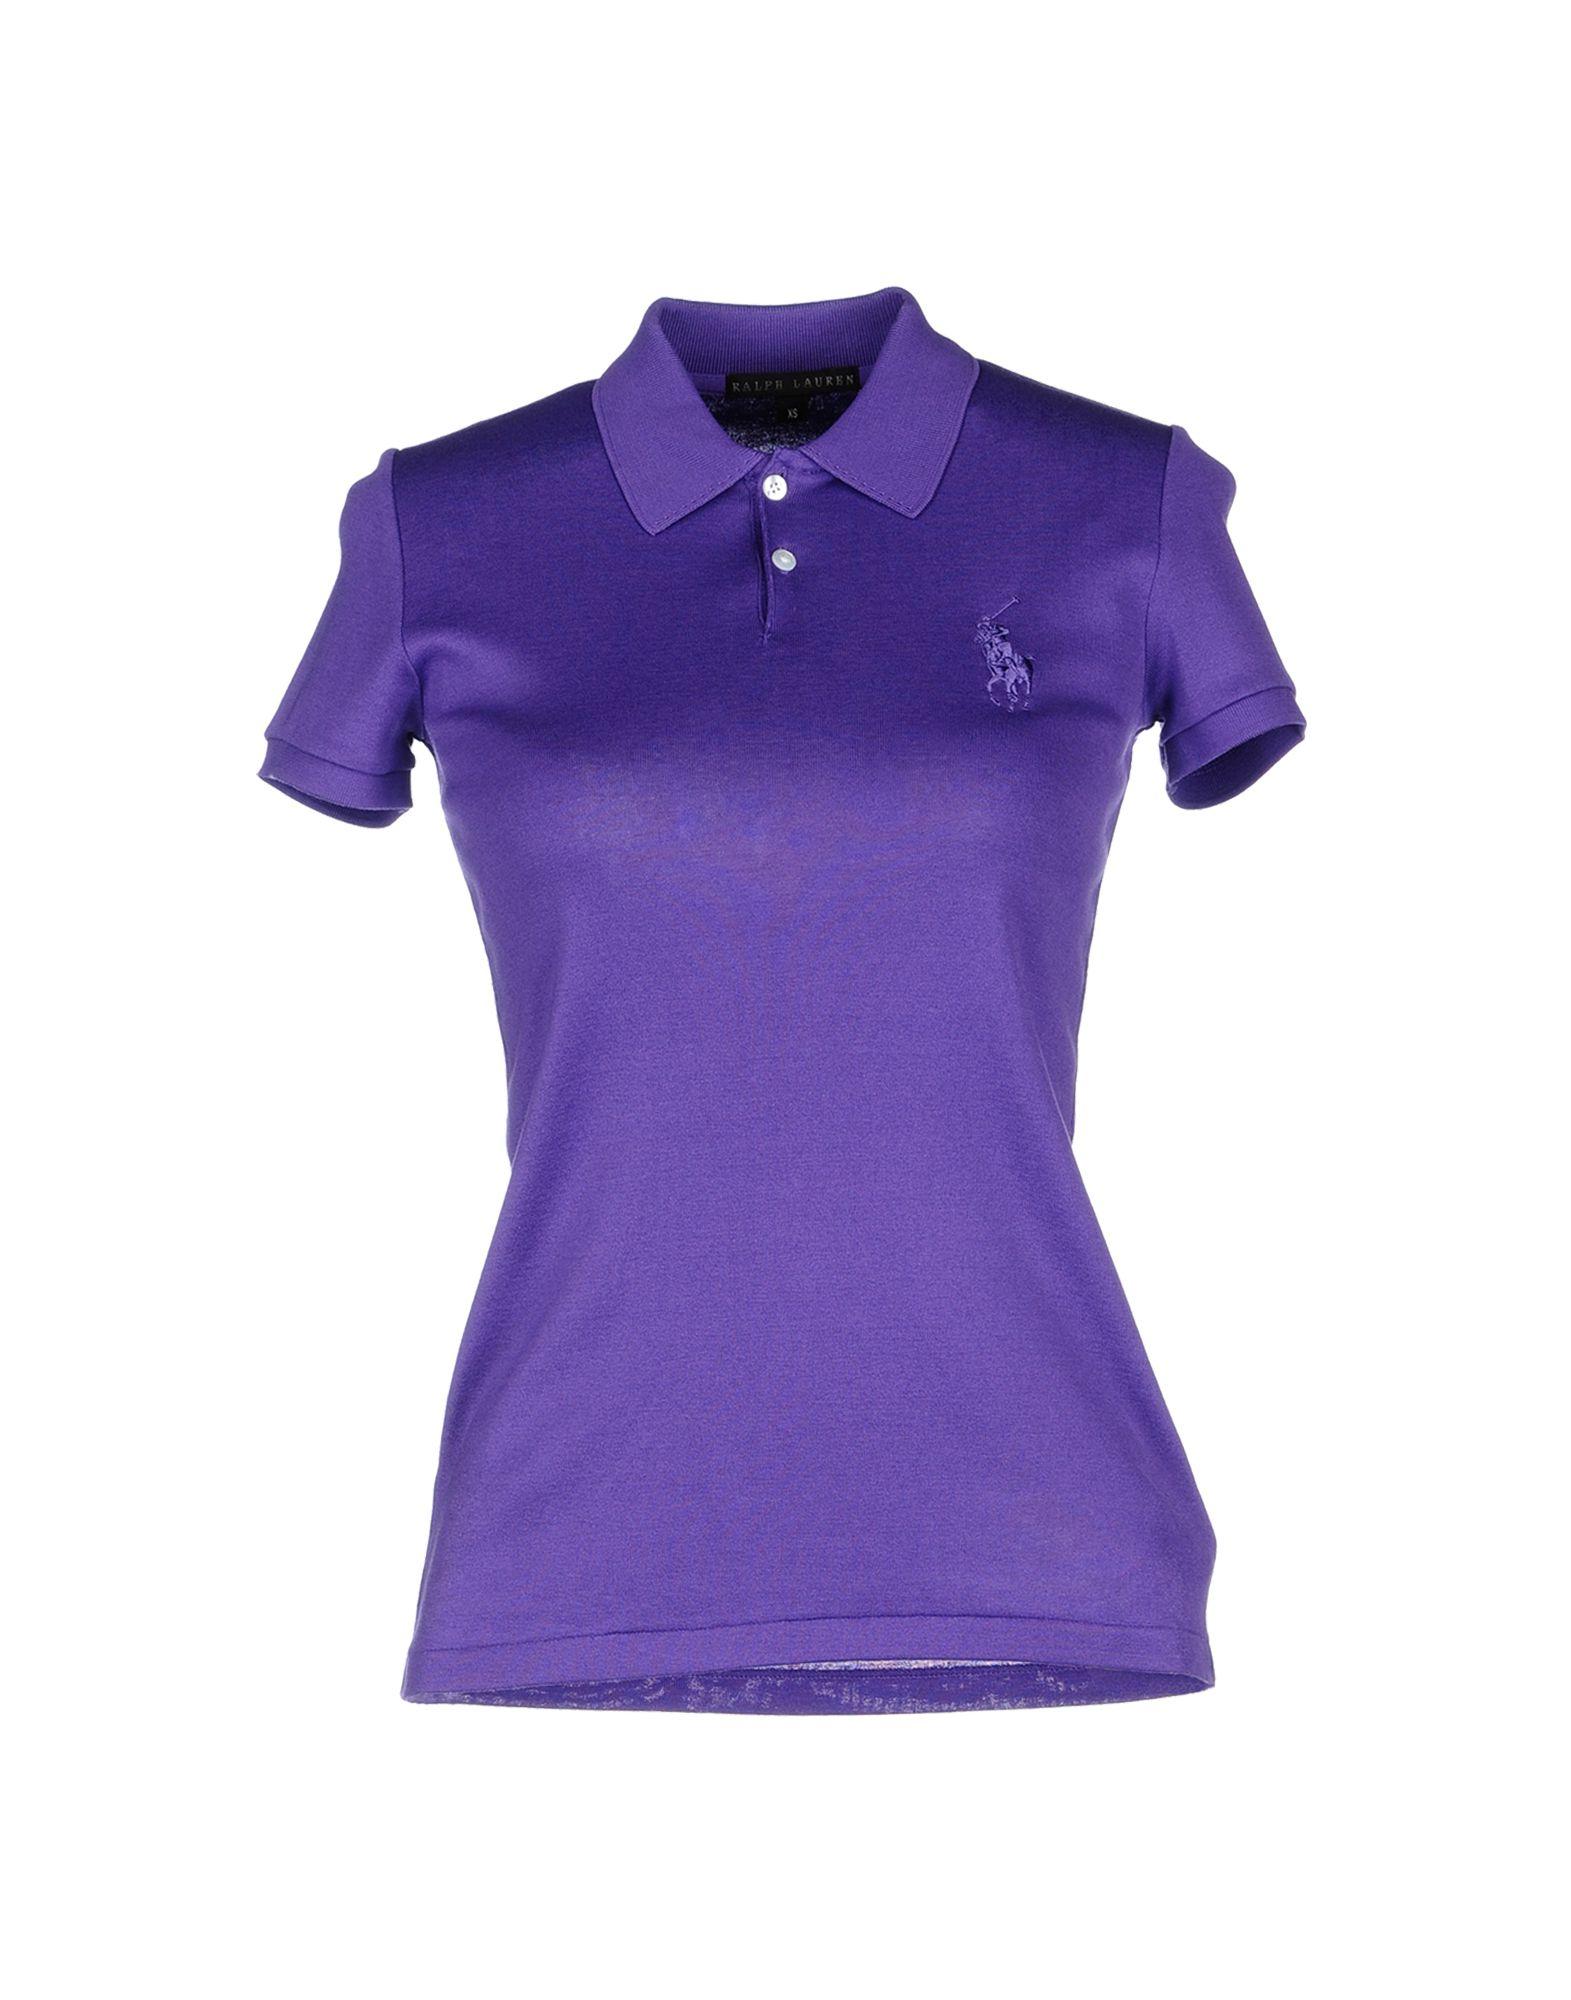 Ralph lauren black label polo shirt in purple mauve lyst for Black ralph lauren shirt purple horse